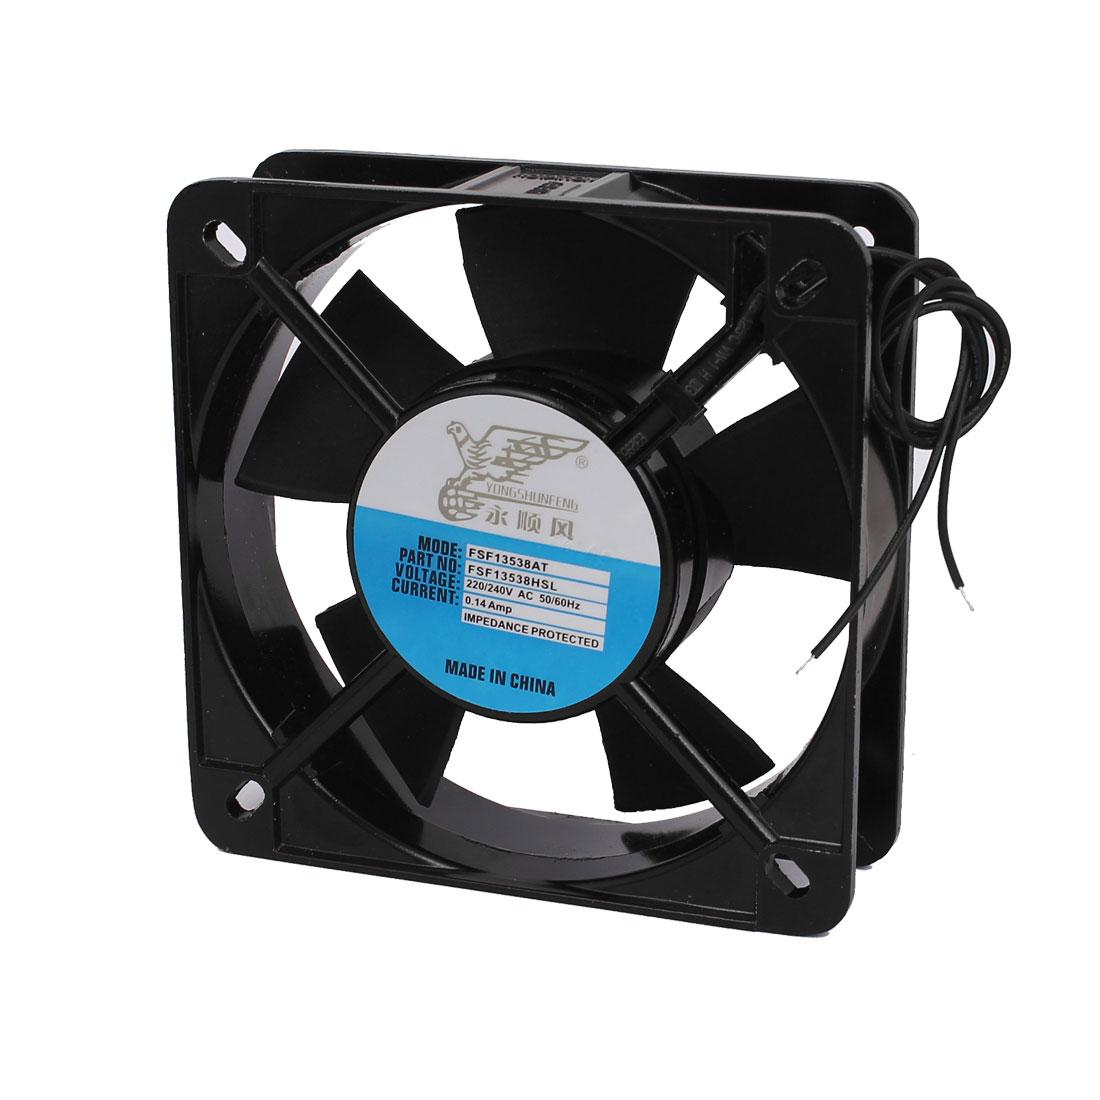 135x40mm Metal Frame Oil Bearing Axial Cooling Fan AC 220/240V